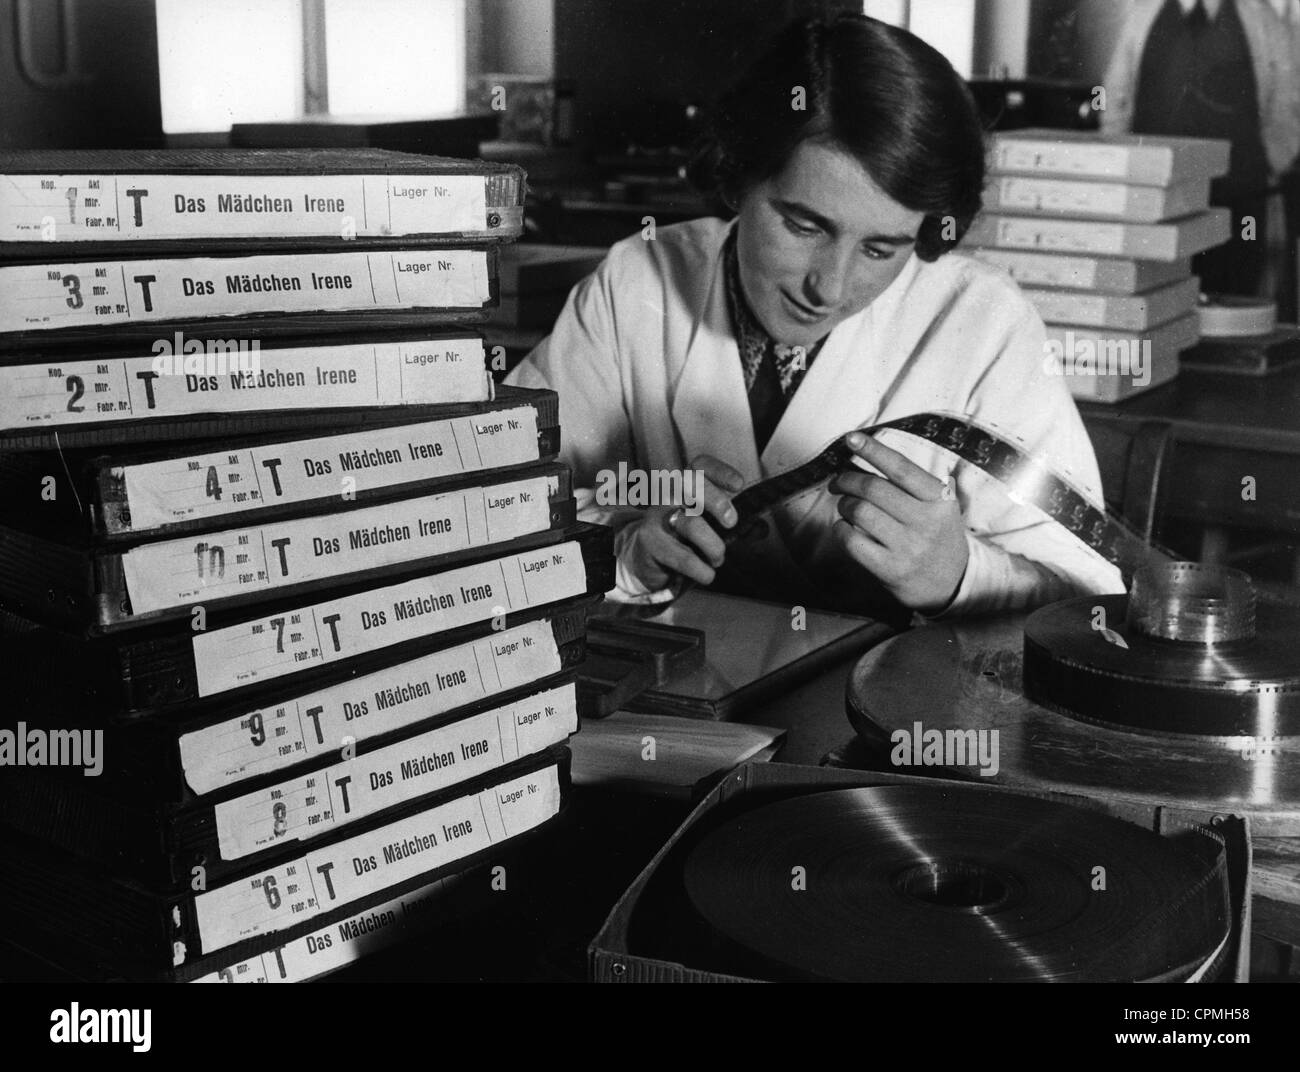 Film laboratory, 1936 - Stock Image